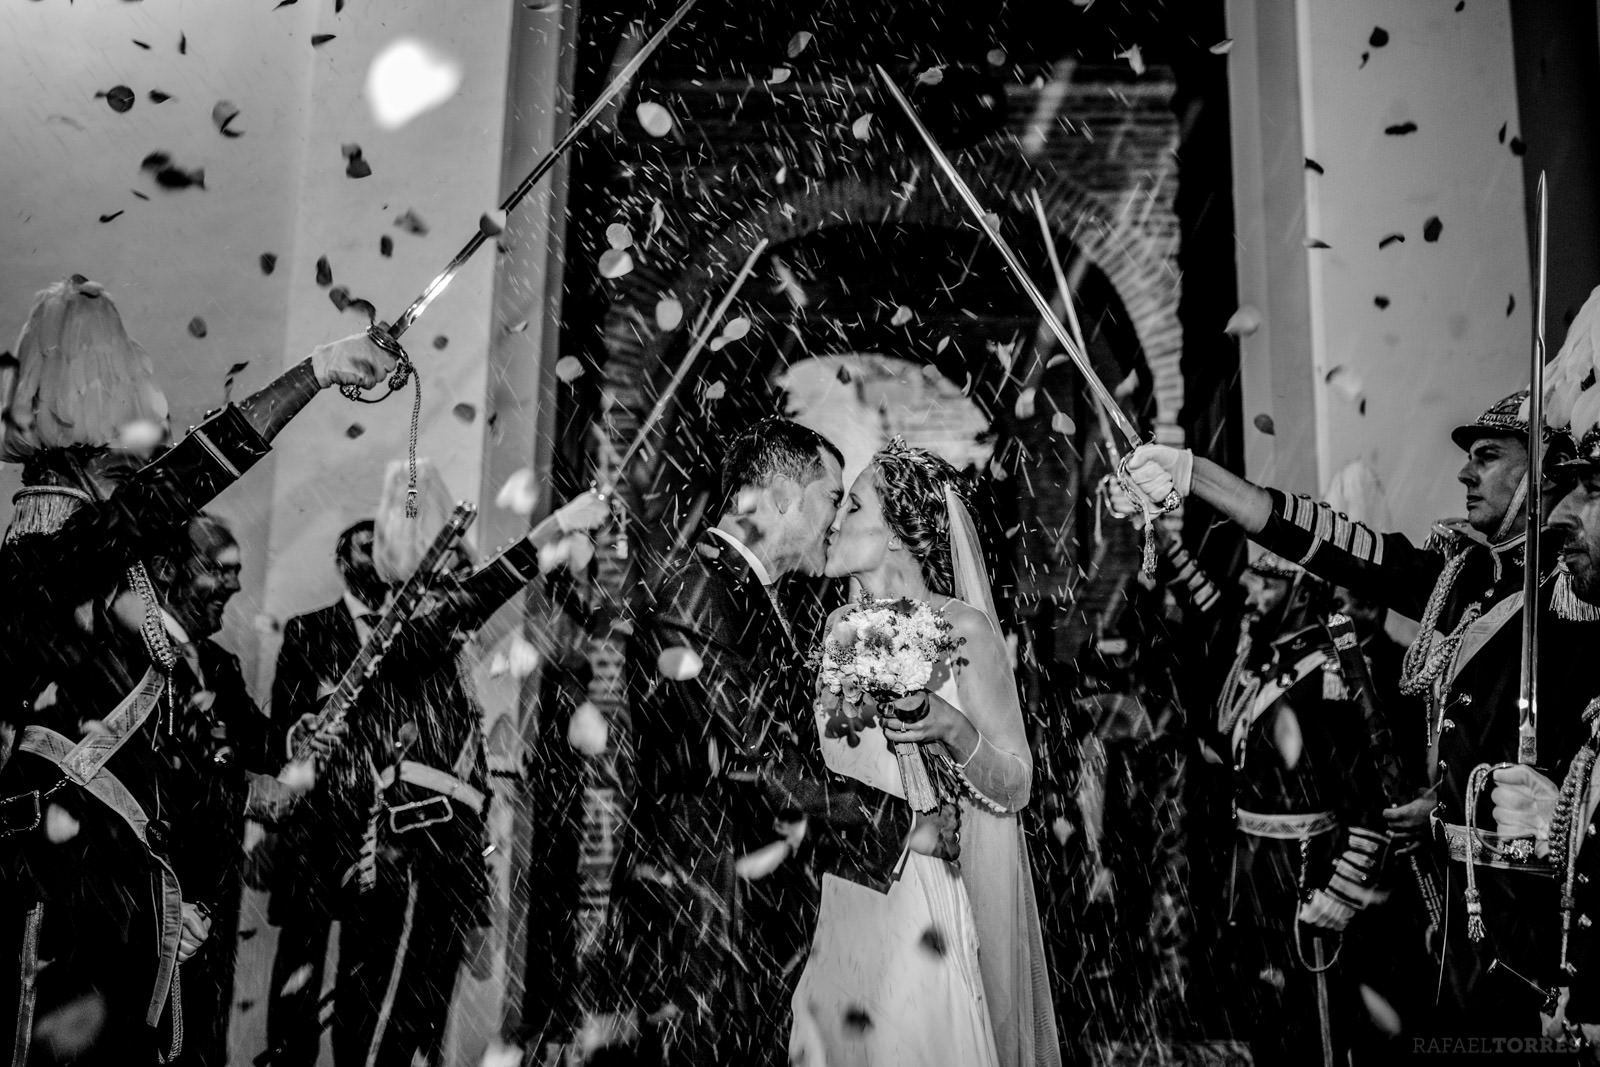 Rafael+Torres+fotografo+bodas+sevilla+madrid+barcelona+wedding+photographer+bodas+diferentes+bodaensevilla+molinillos+fotografo+hacienda+oran+alfonso+wedding+photographer-29.jpg